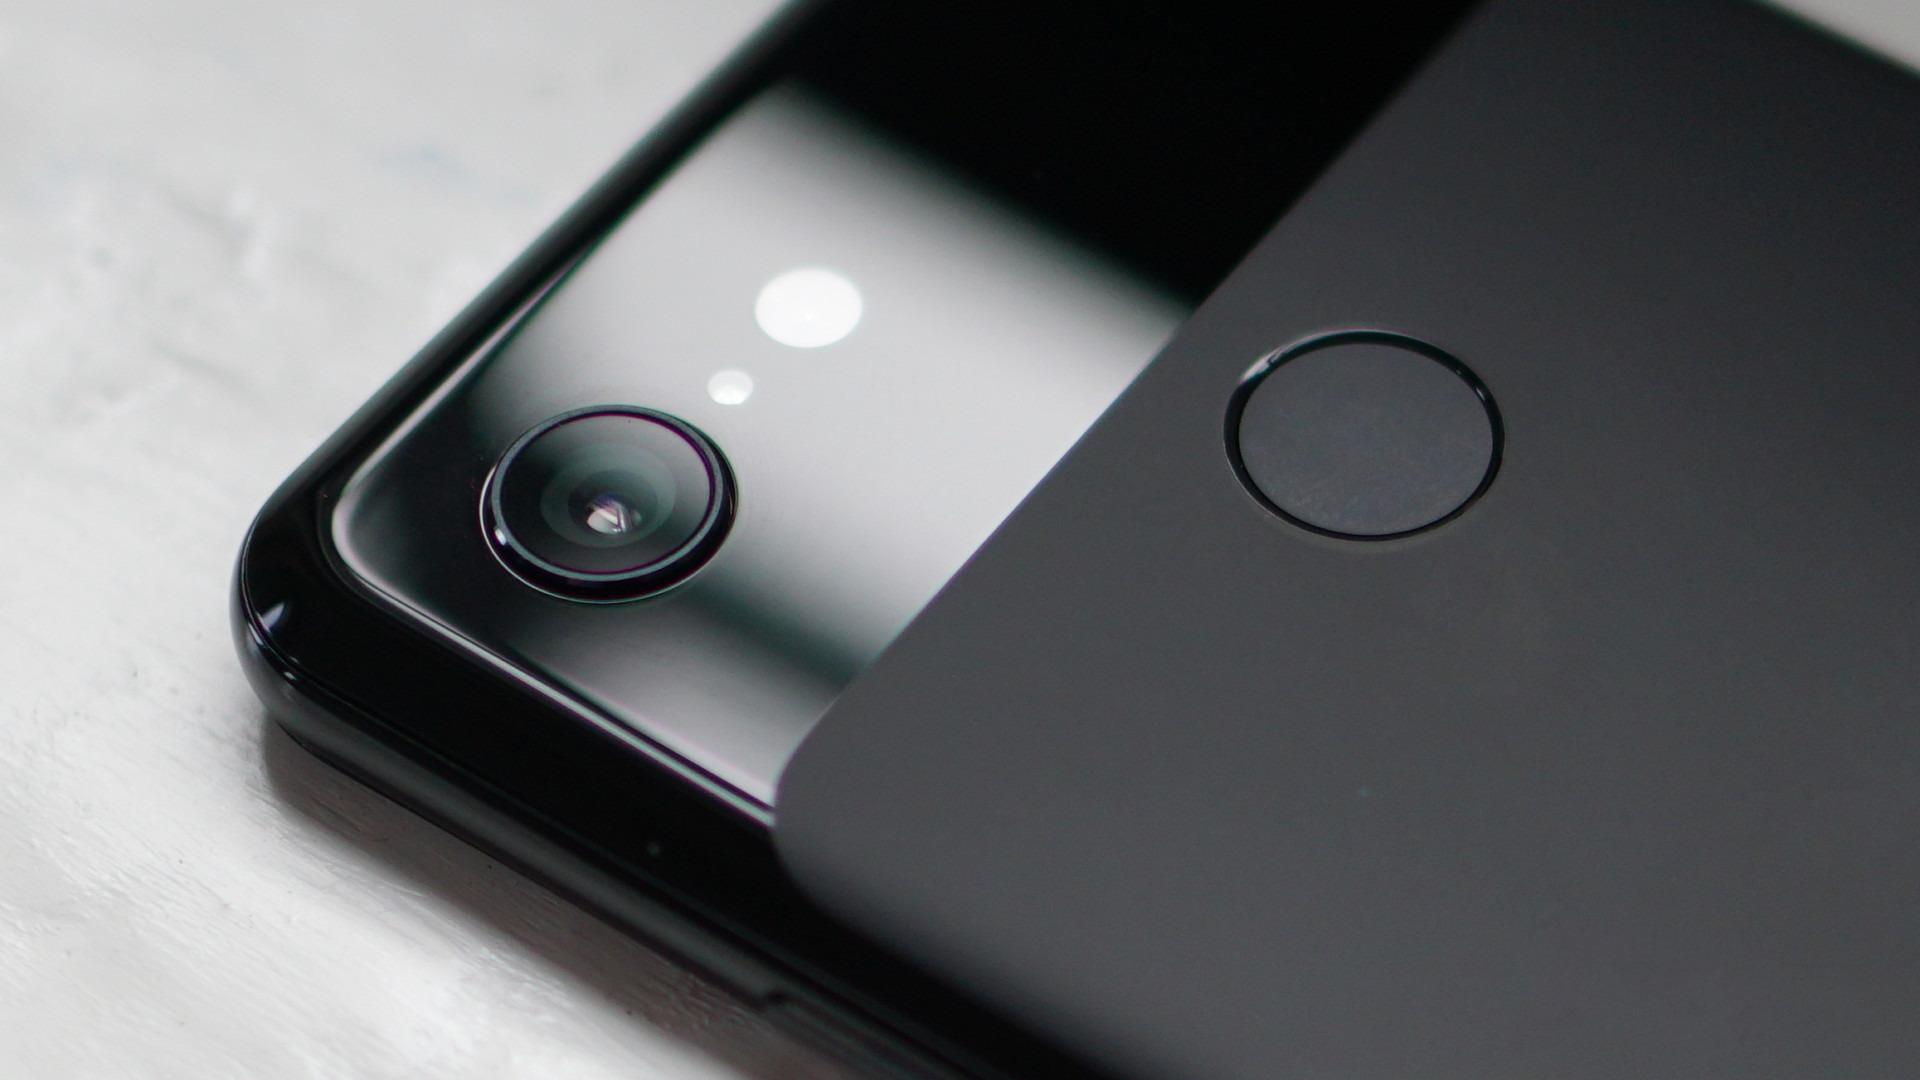 Google Pixel 3 in black color